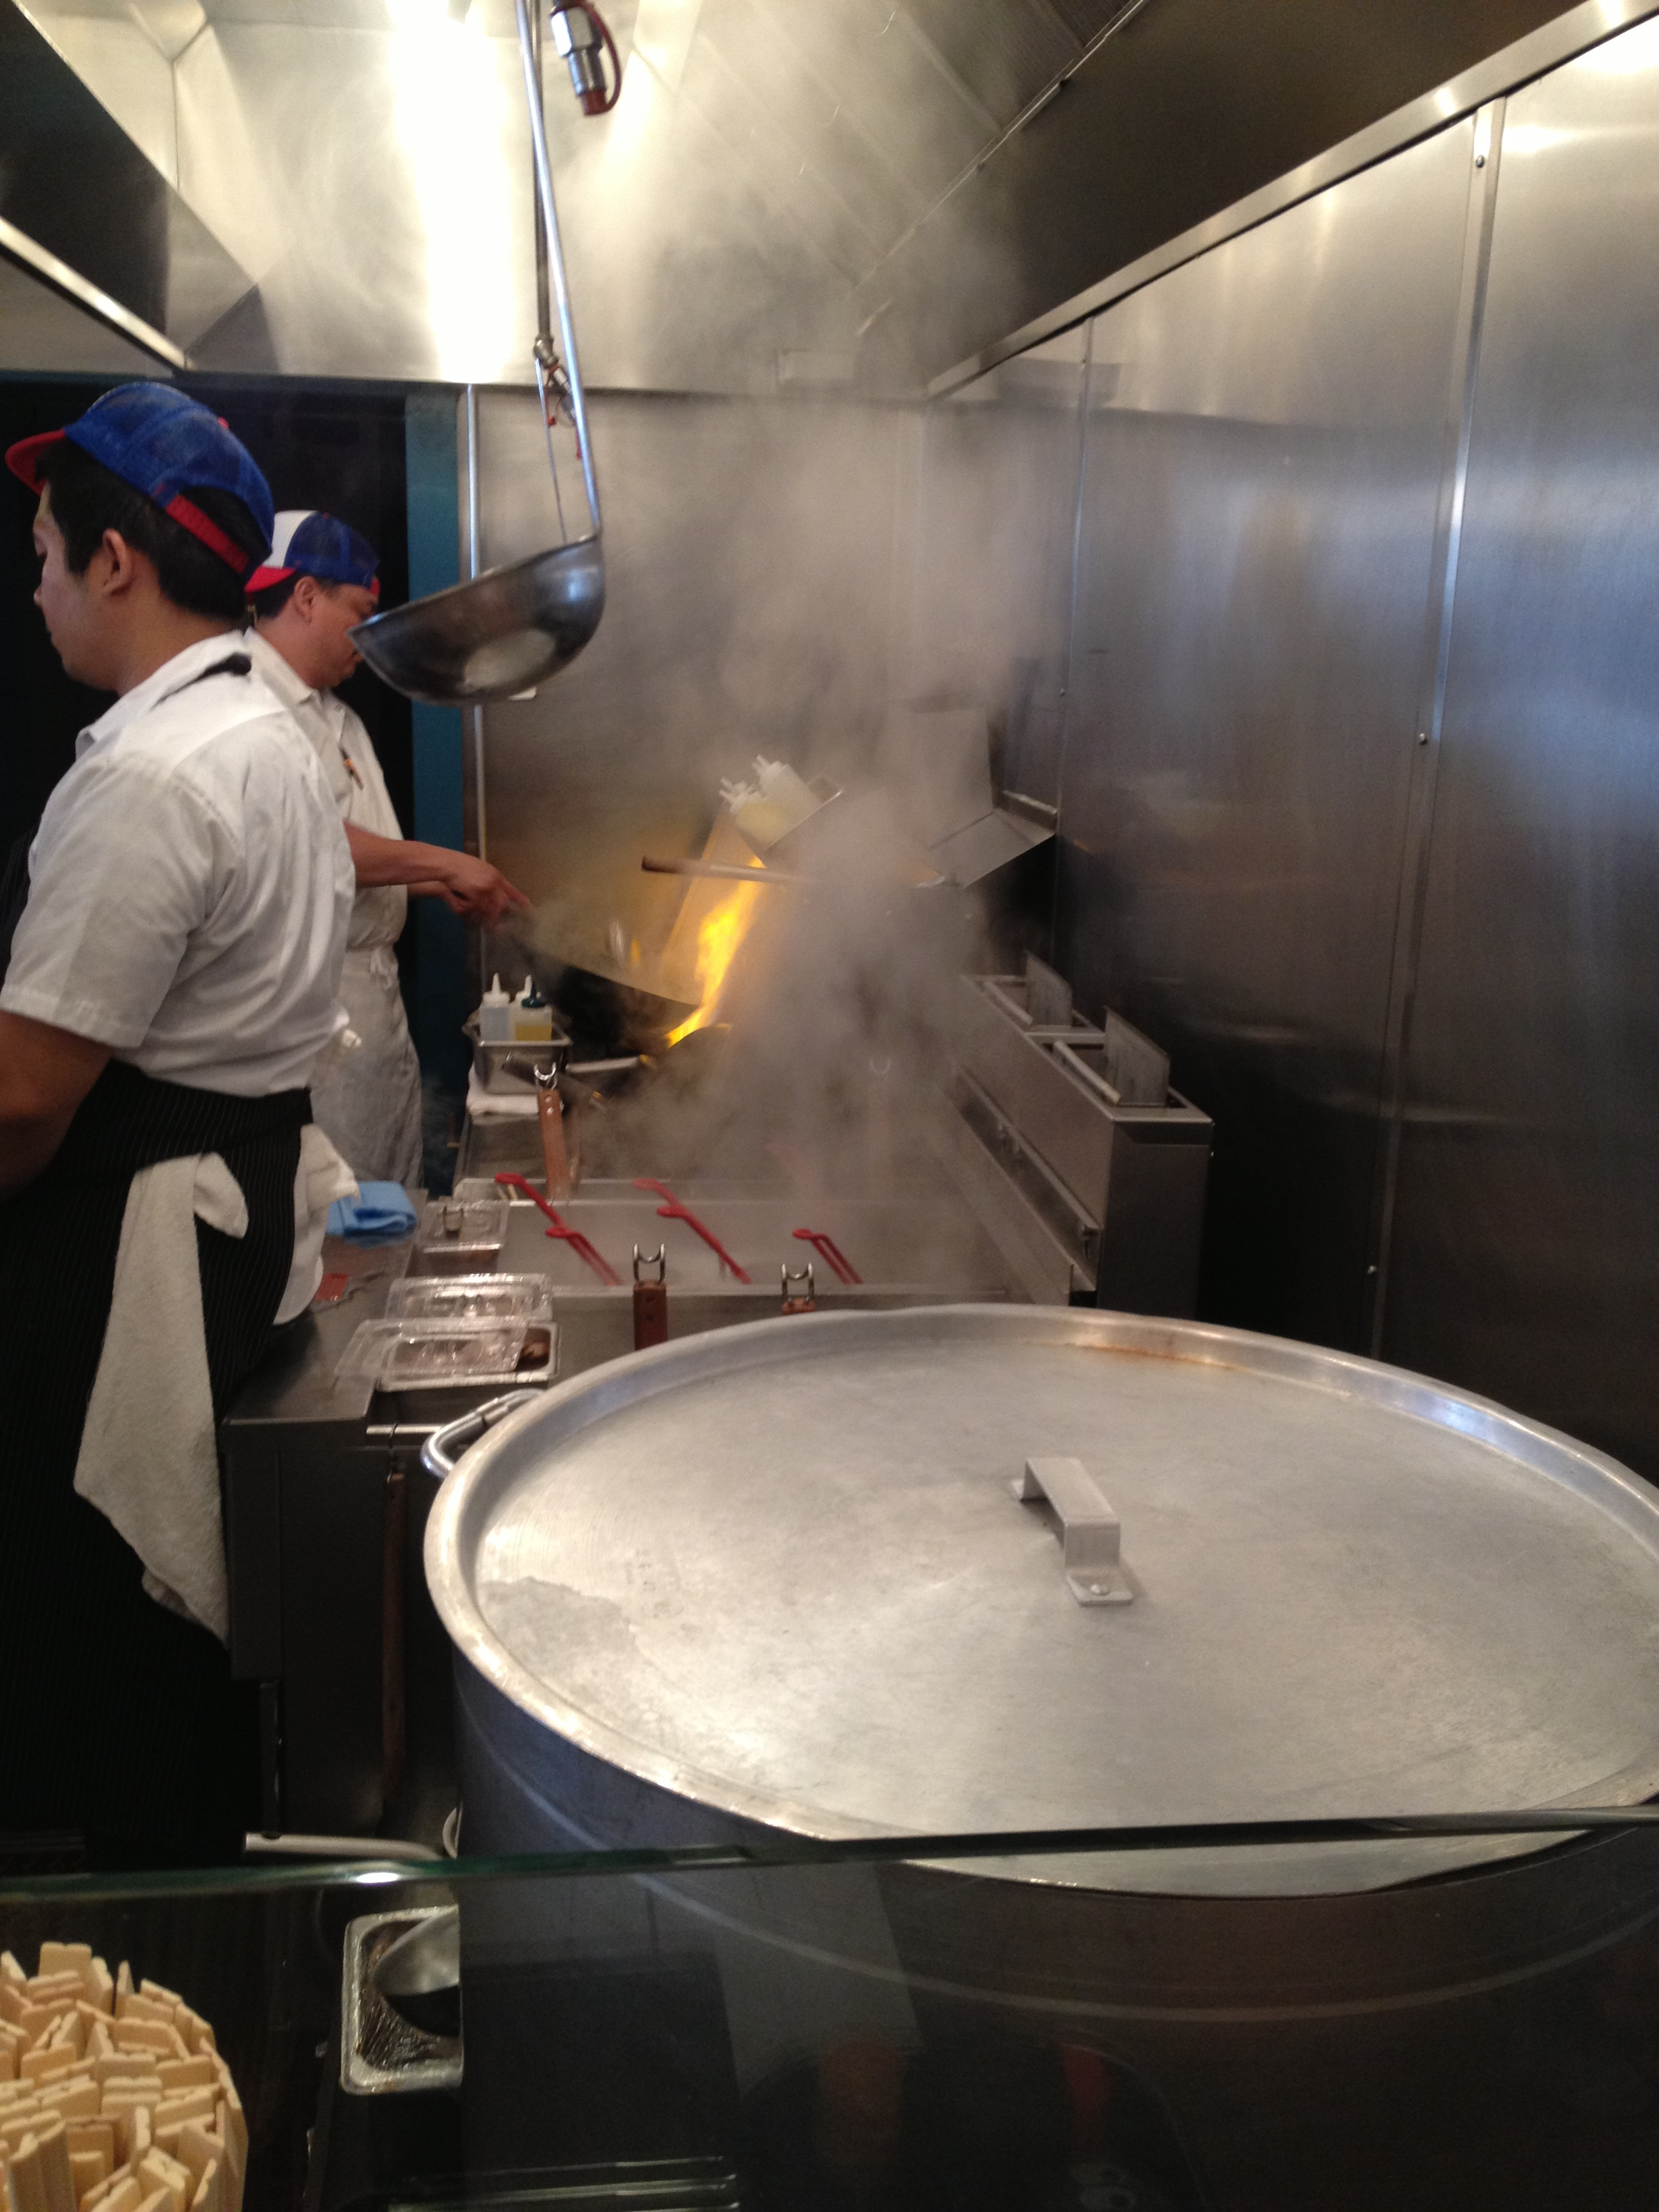 The ramen chefs in action